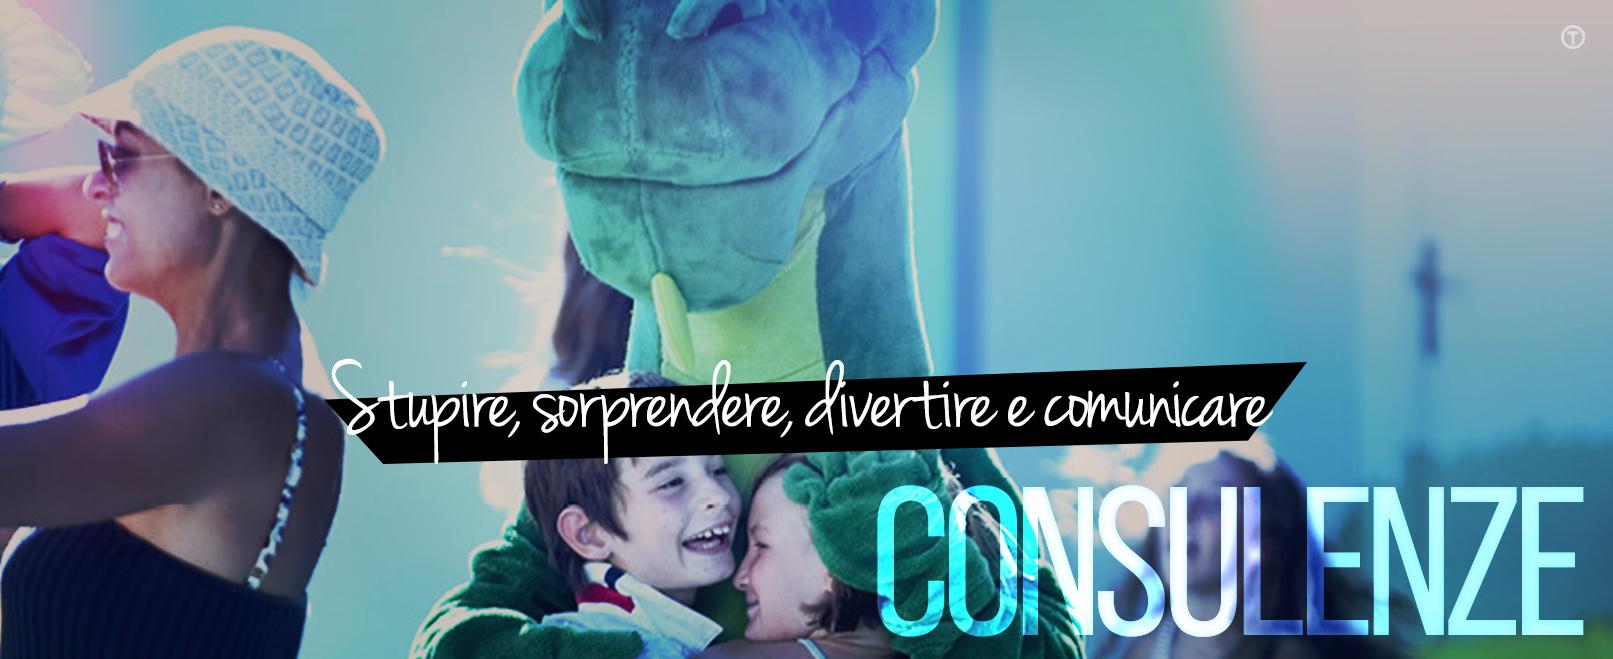 consulenze2